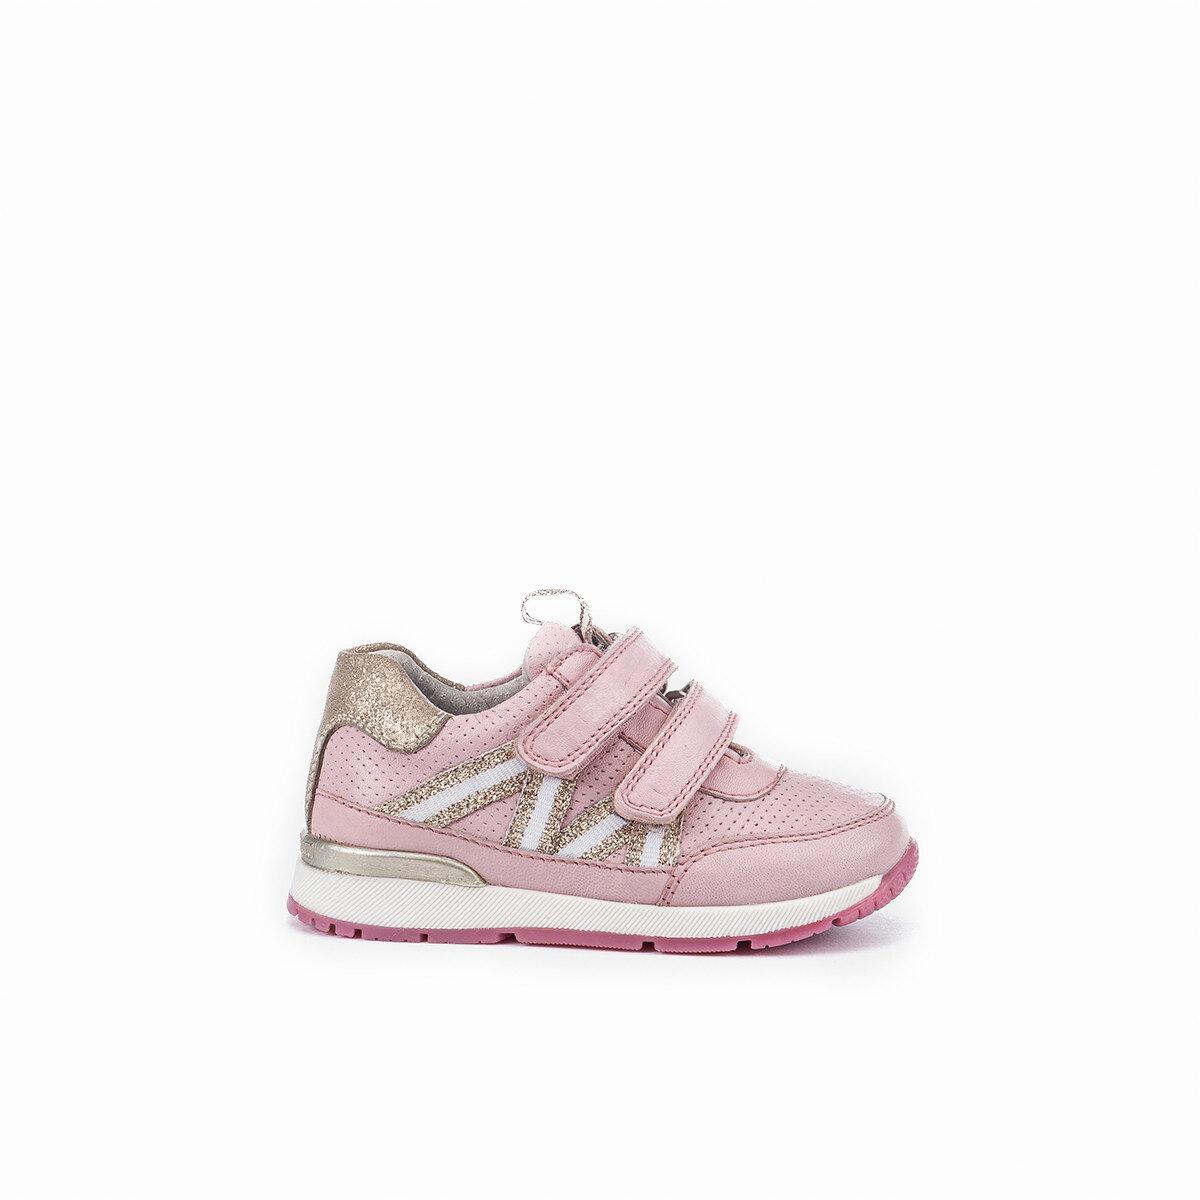 SQUISH Sneakers Bambina